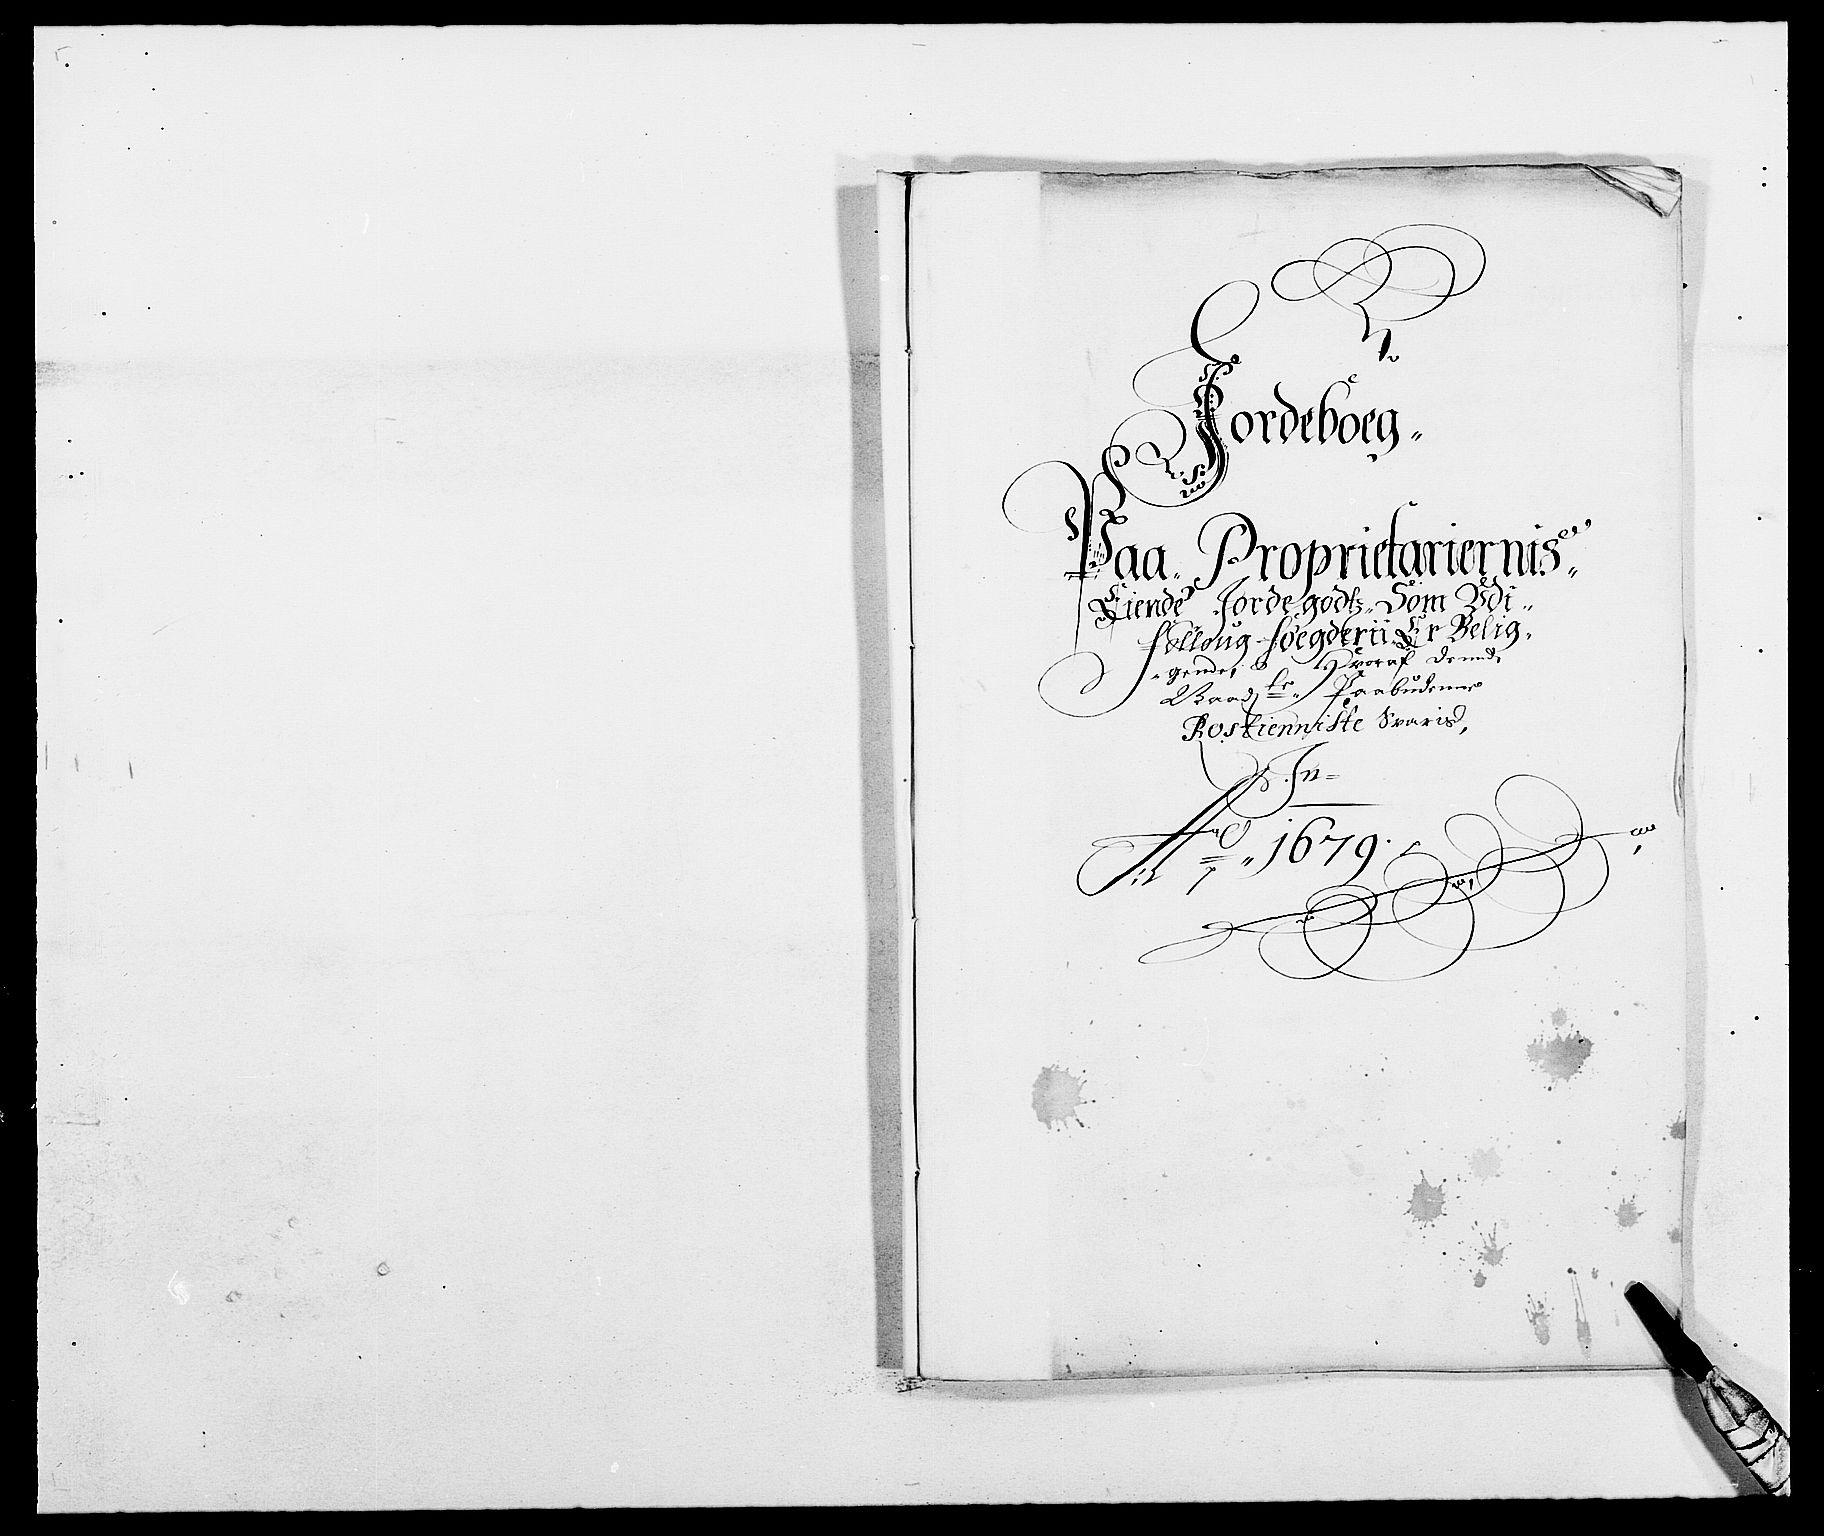 RA, Rentekammeret inntil 1814, Reviderte regnskaper, Fogderegnskap, R09/L0428: Fogderegnskap Follo, 1679, s. 115